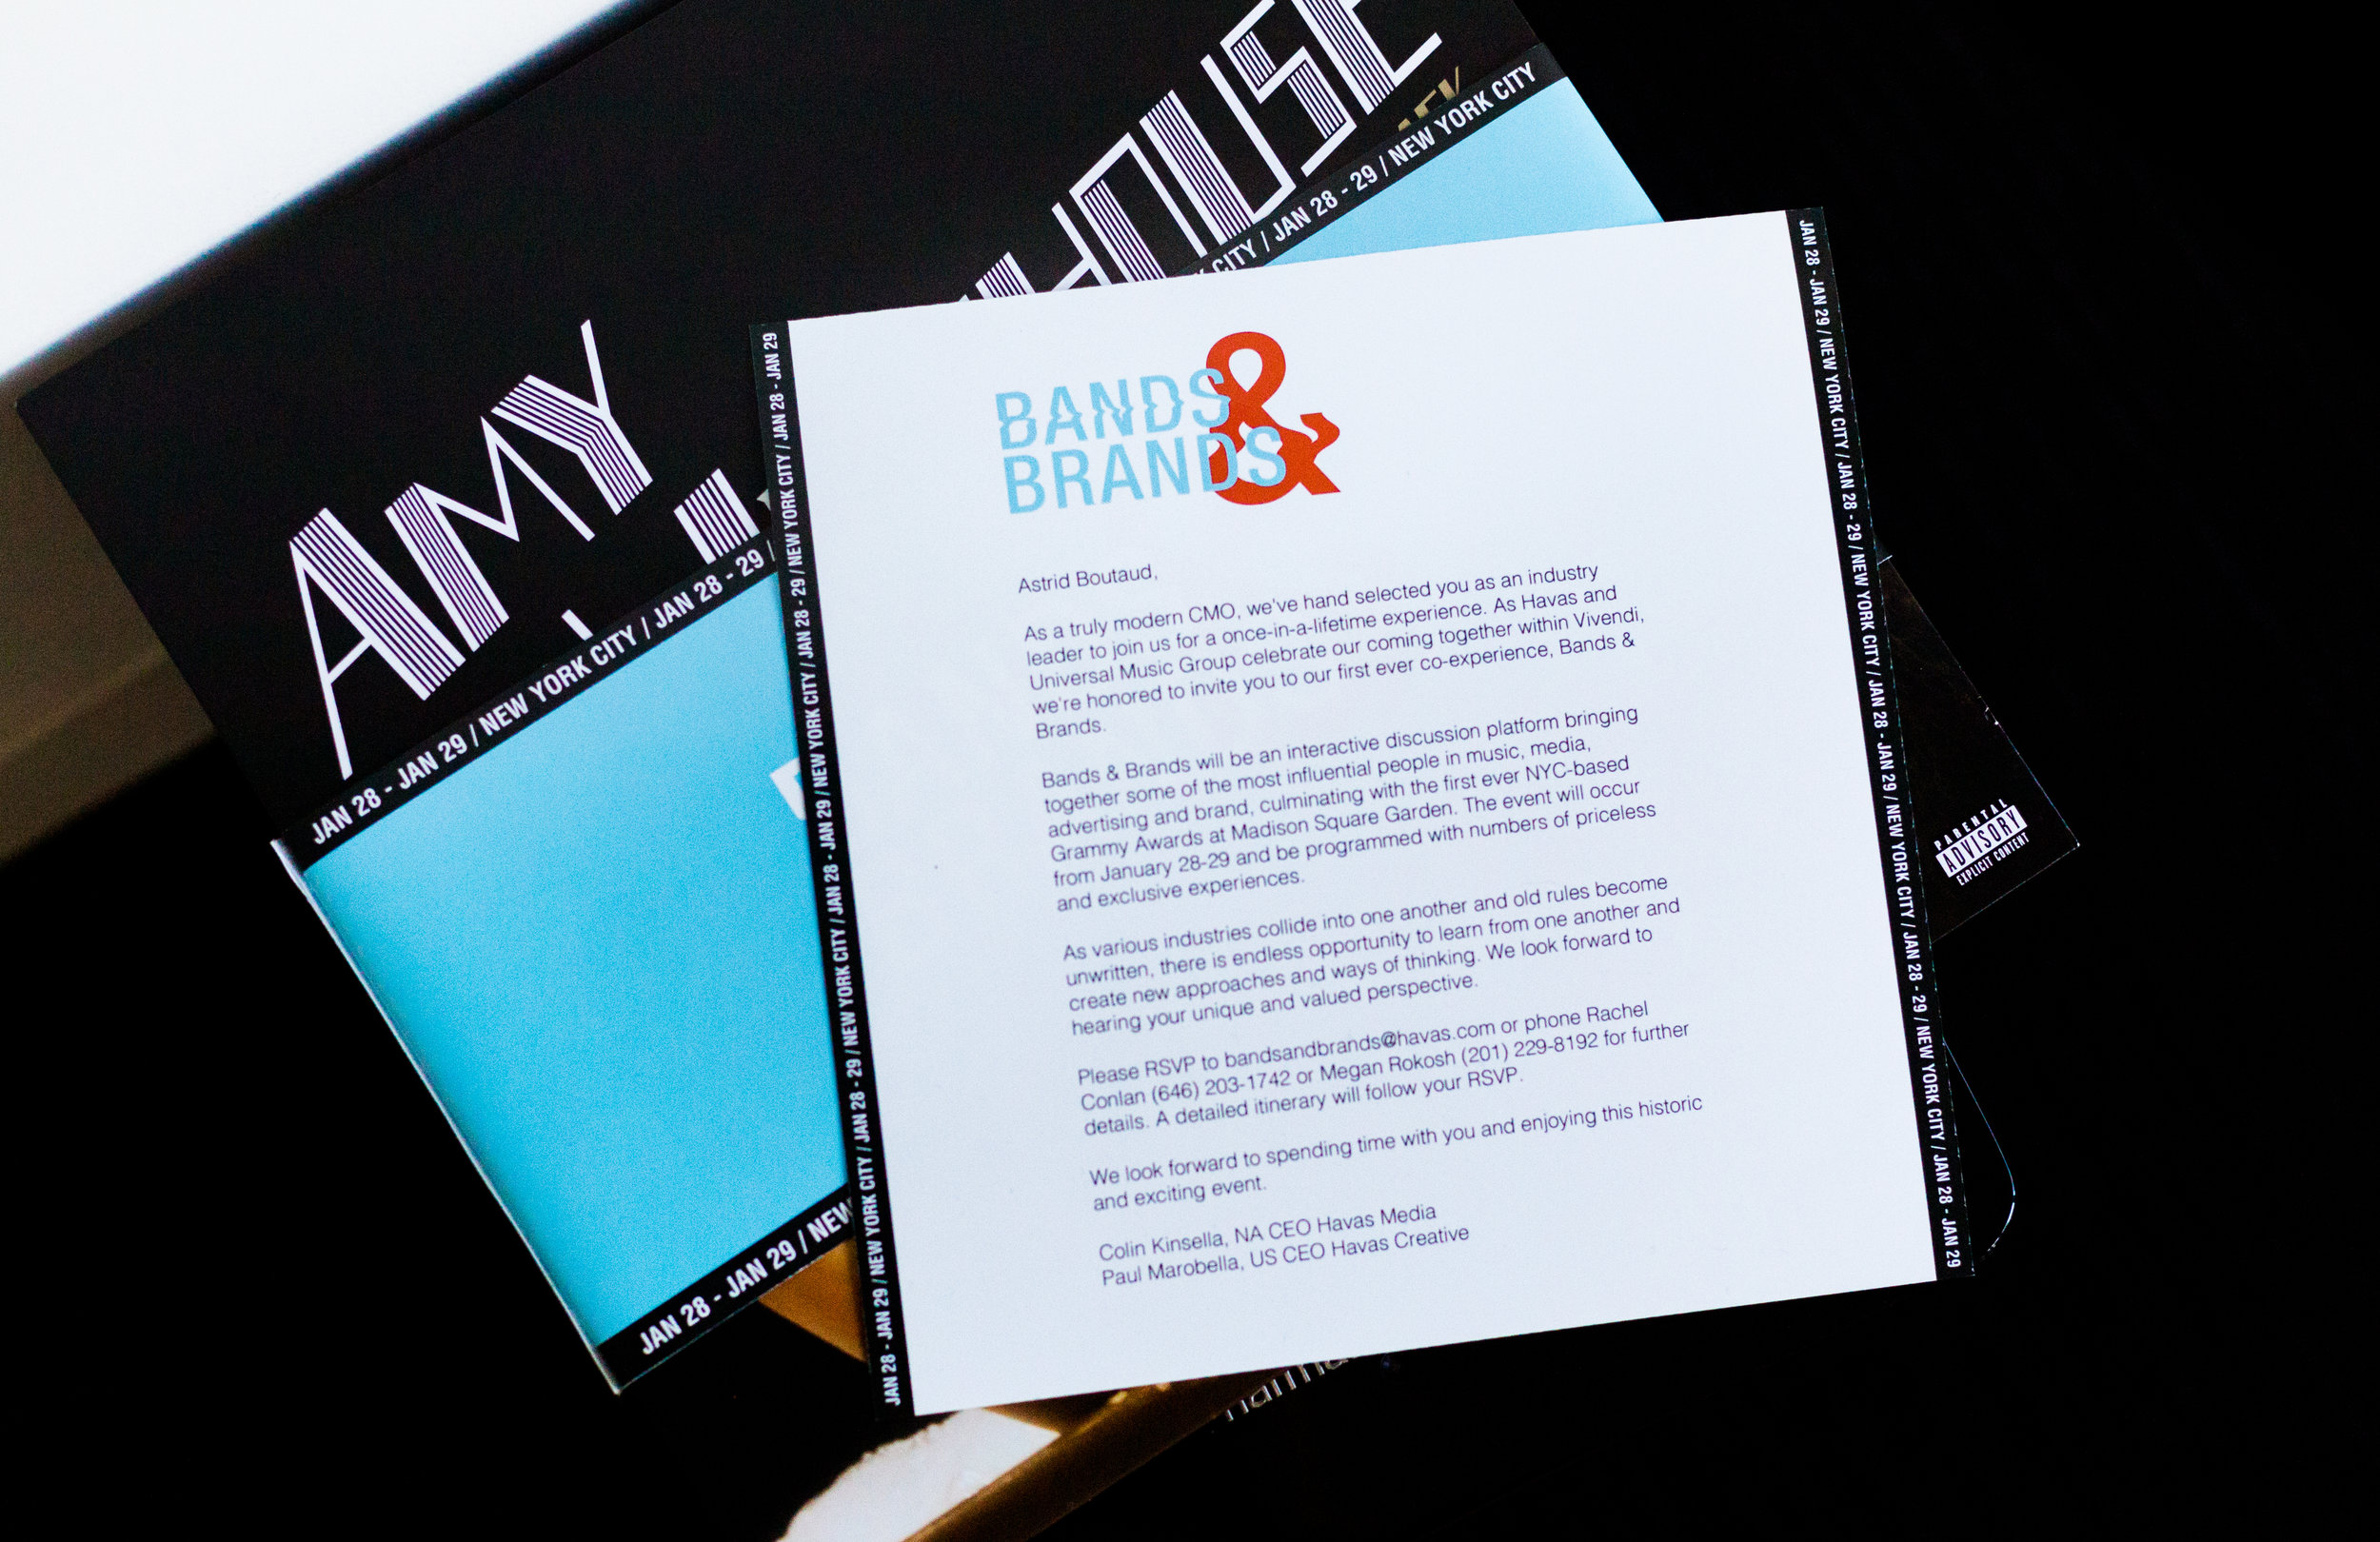 Bands&Brands_Invite_04.jpg